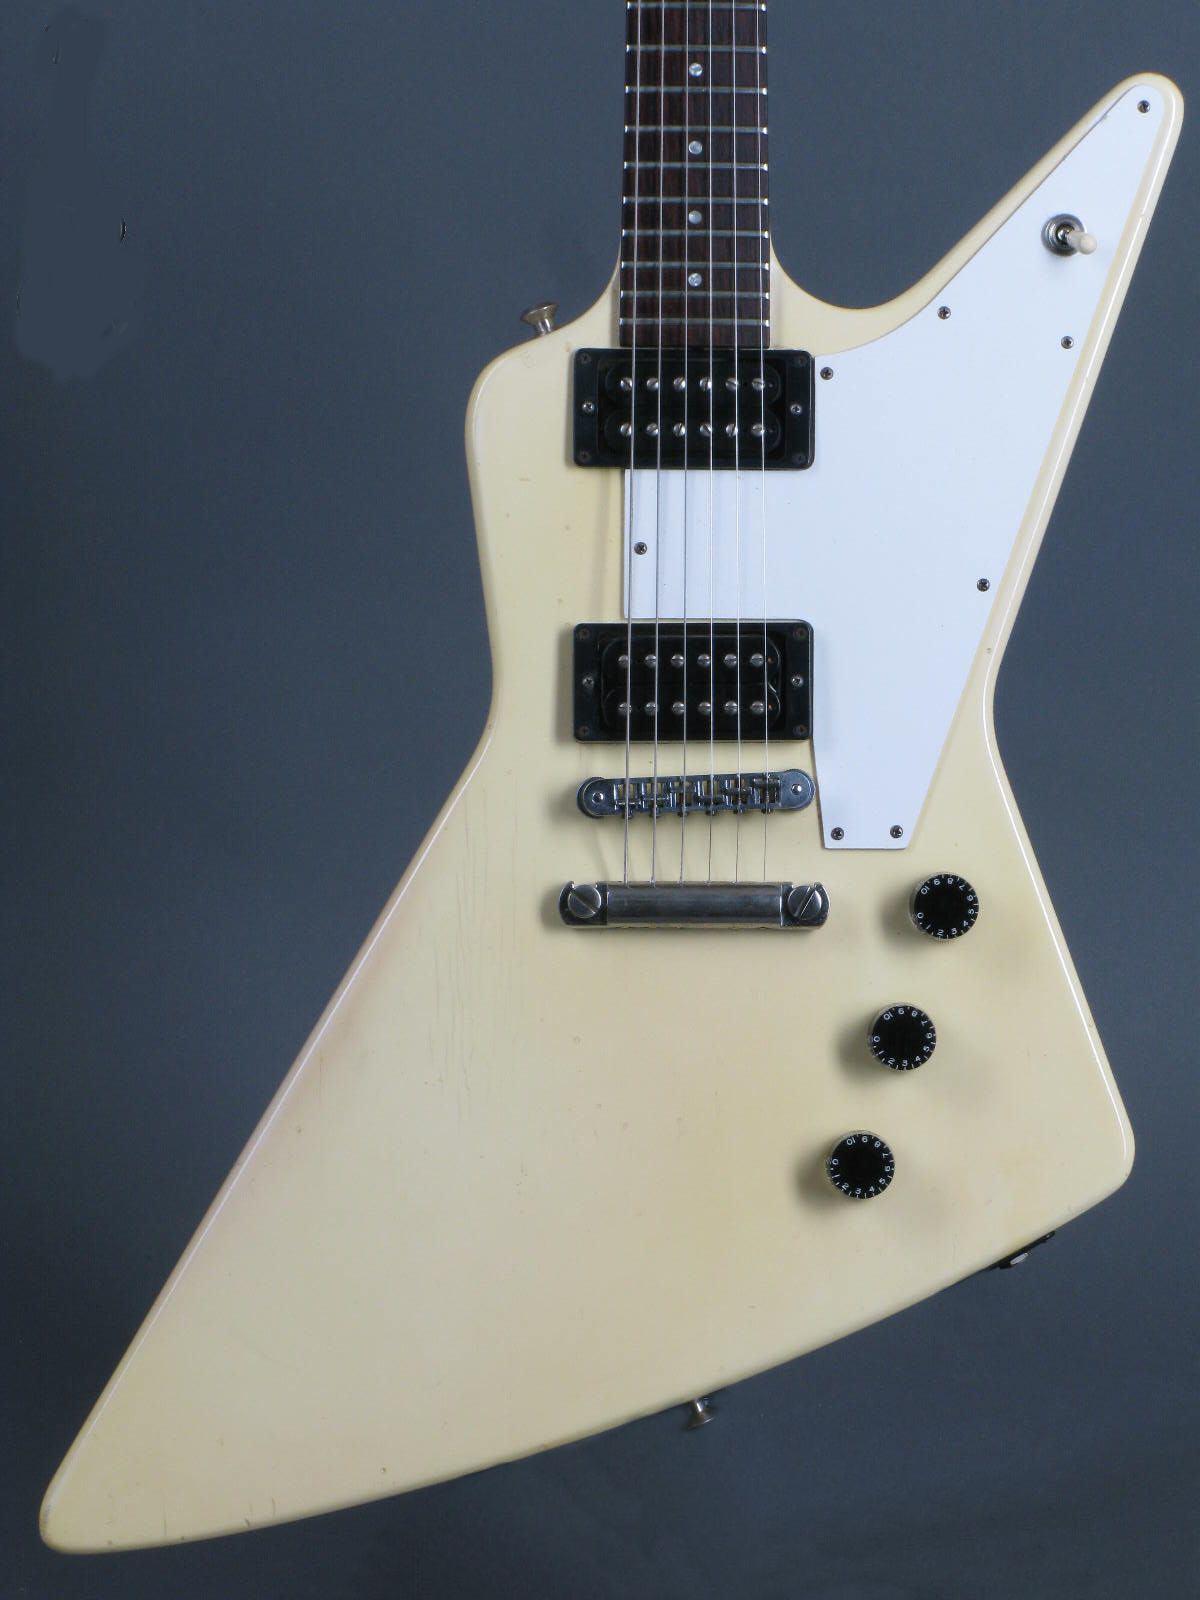 Gibson Solidbodies - Other Models: Flying V, Firebird, Sonex